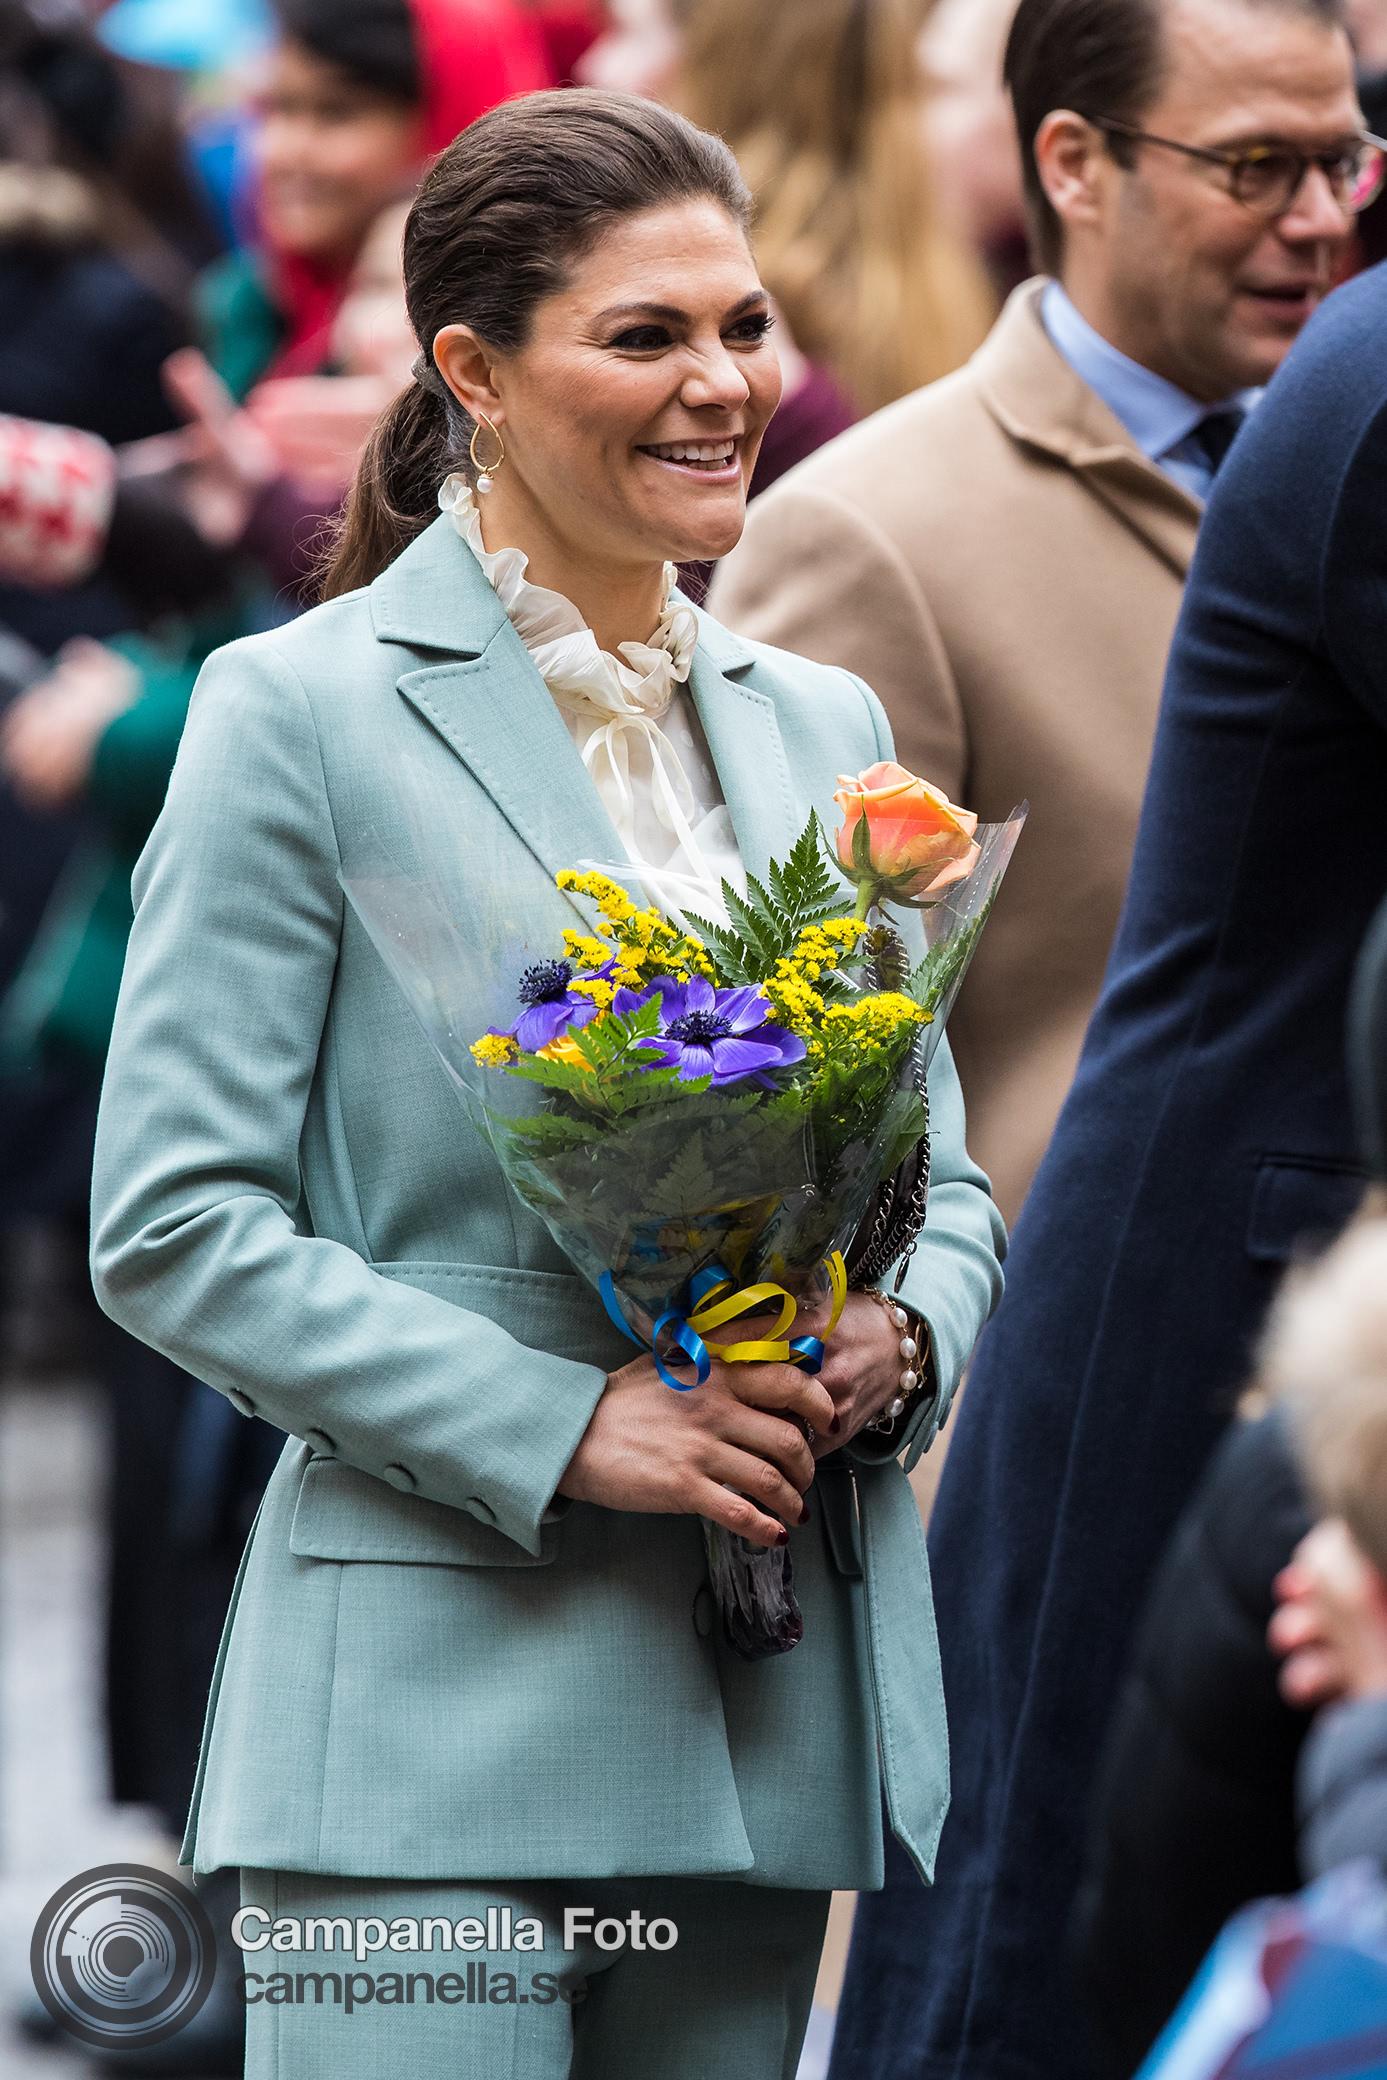 Duke & Duchess of Cambridge visit Stockholm - Michael Campanella Photography